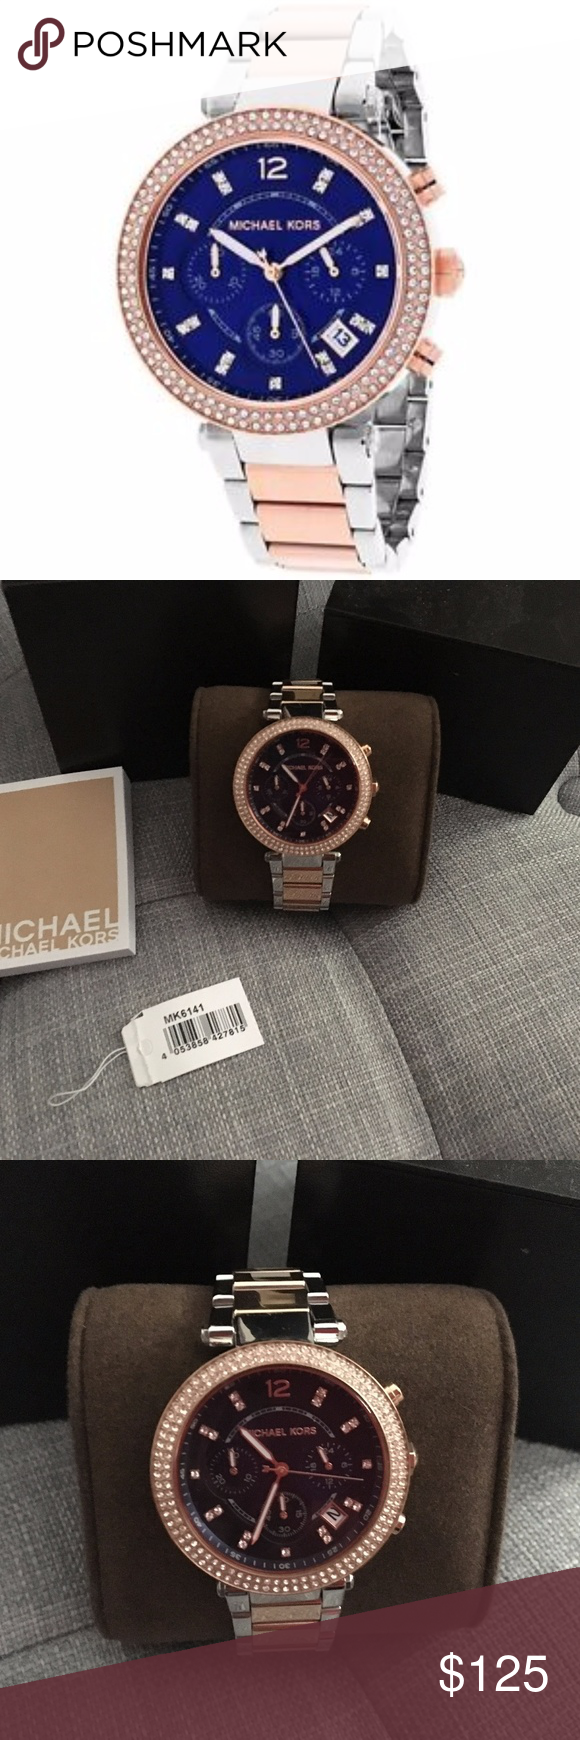 54dba8aae485 Michael Kors MK6141 Parker Rose Gold Blue Watch Michael Kors women s MK6141  parker rose gold watch